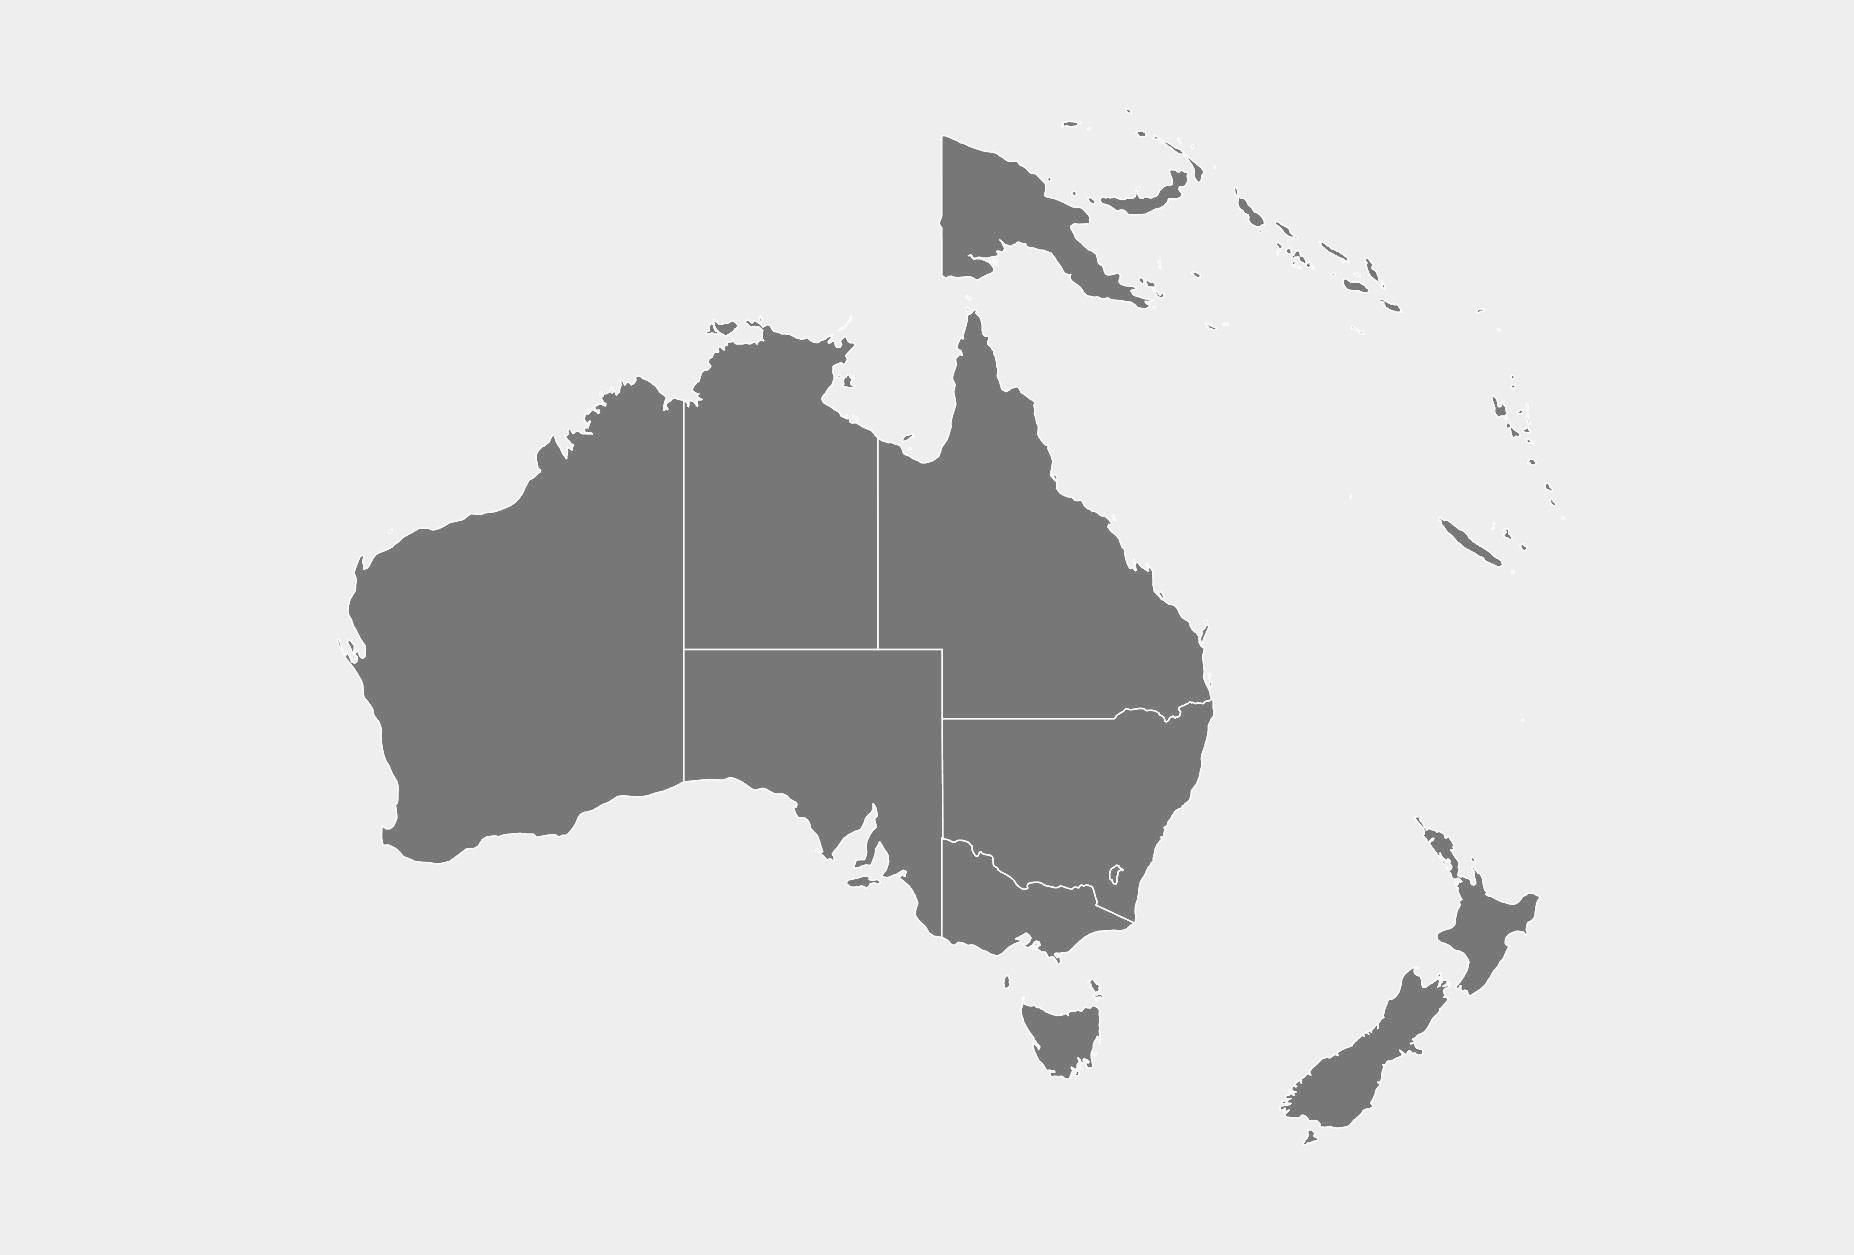 OCEANIA MAP